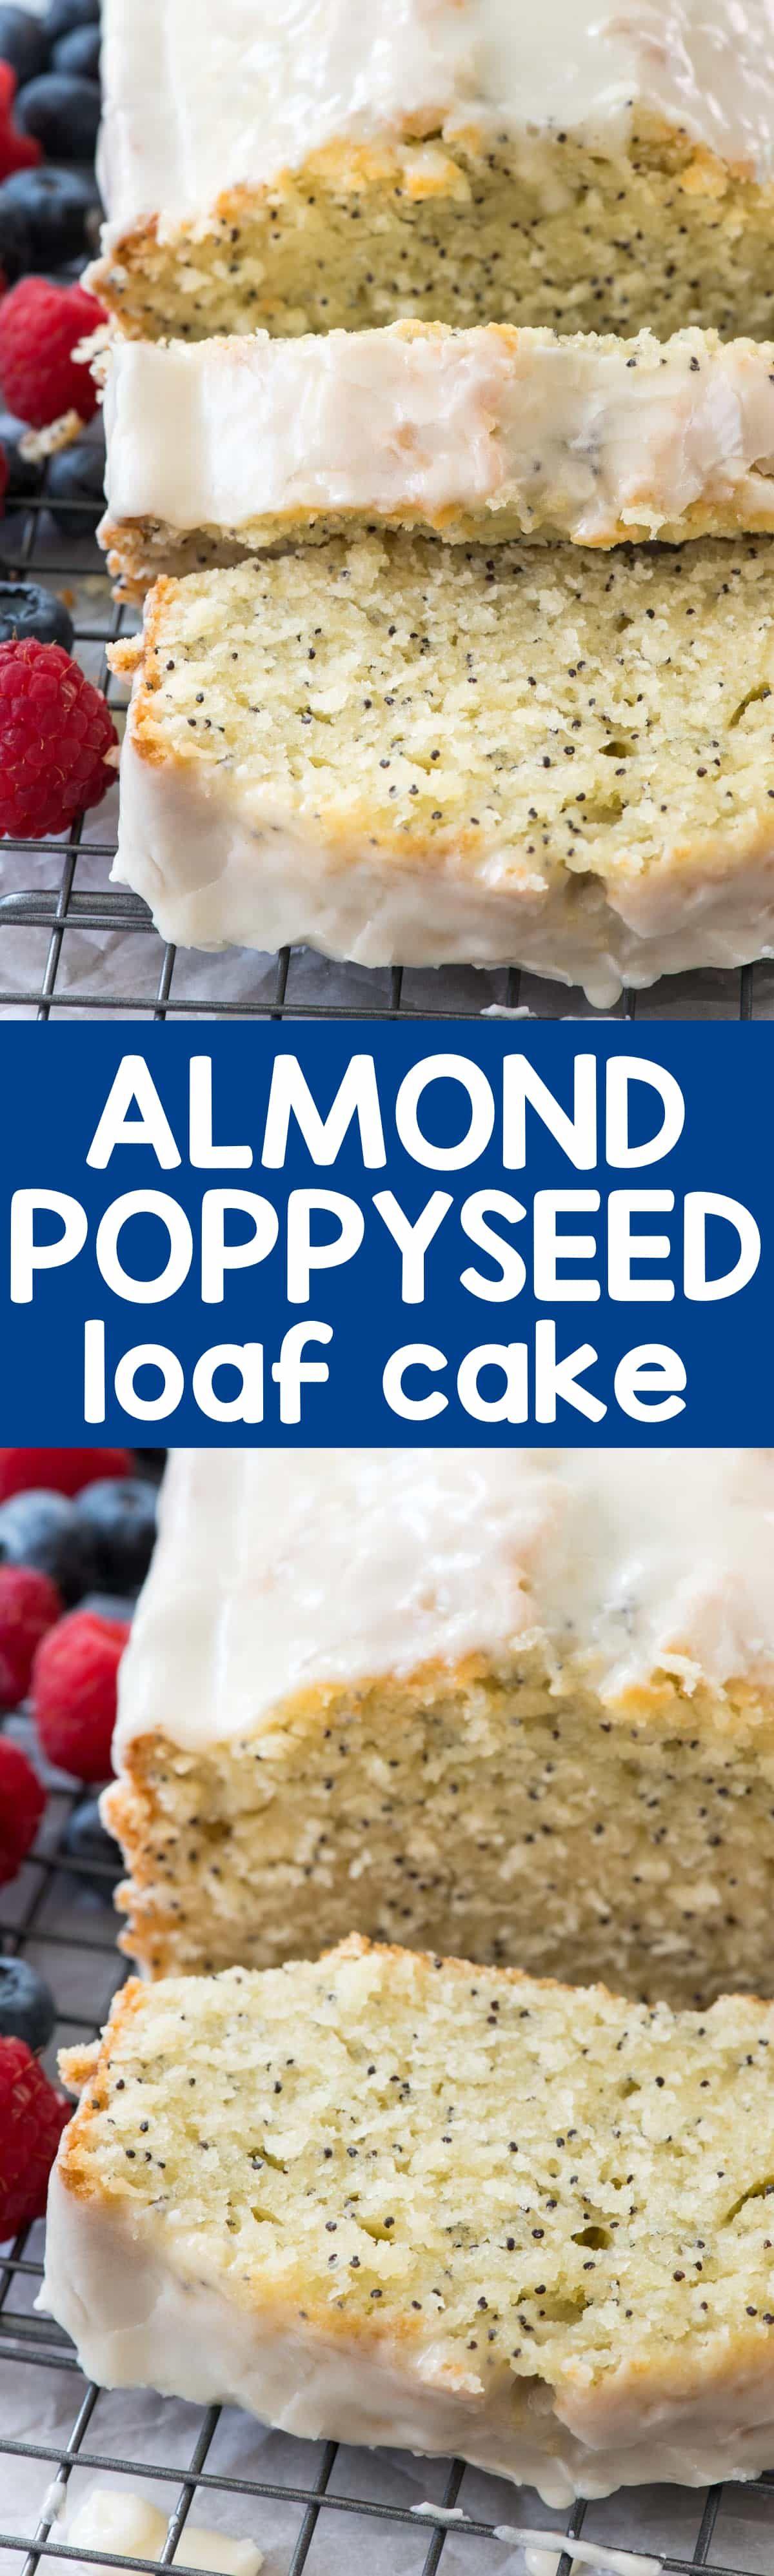 Almond Poppyseed Loaf Cake